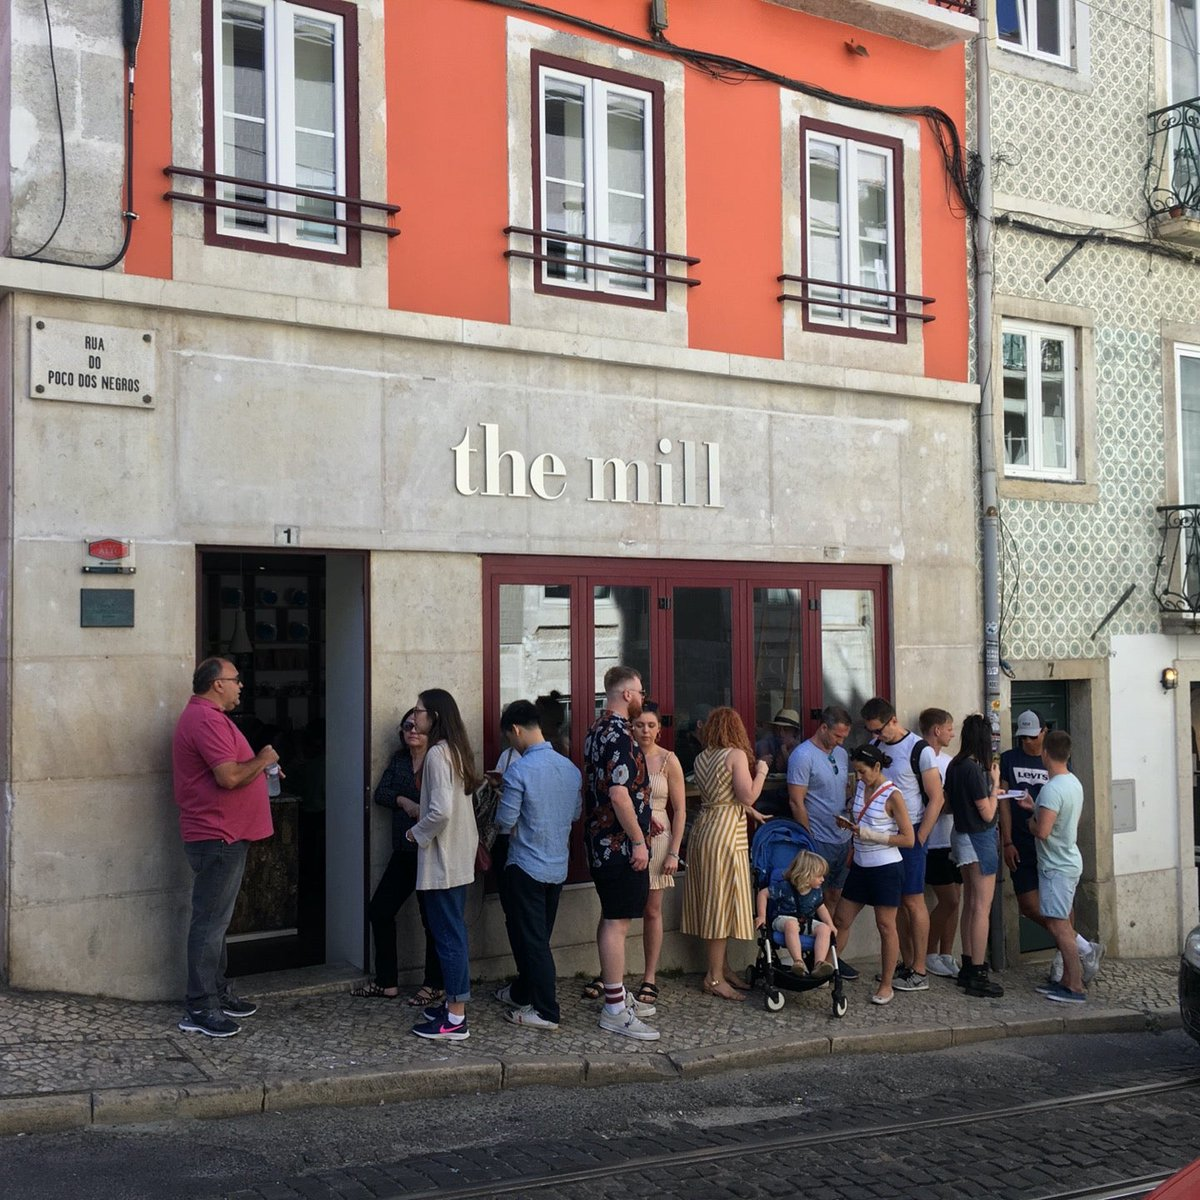 test ツイッターメディア - リスボンの人気カフェ。朝食おすすめです。 (@ The Mill in Lisboa, Lisbon) https://t.co/e3jFhREORJ https://t.co/r4F6RDFAh3